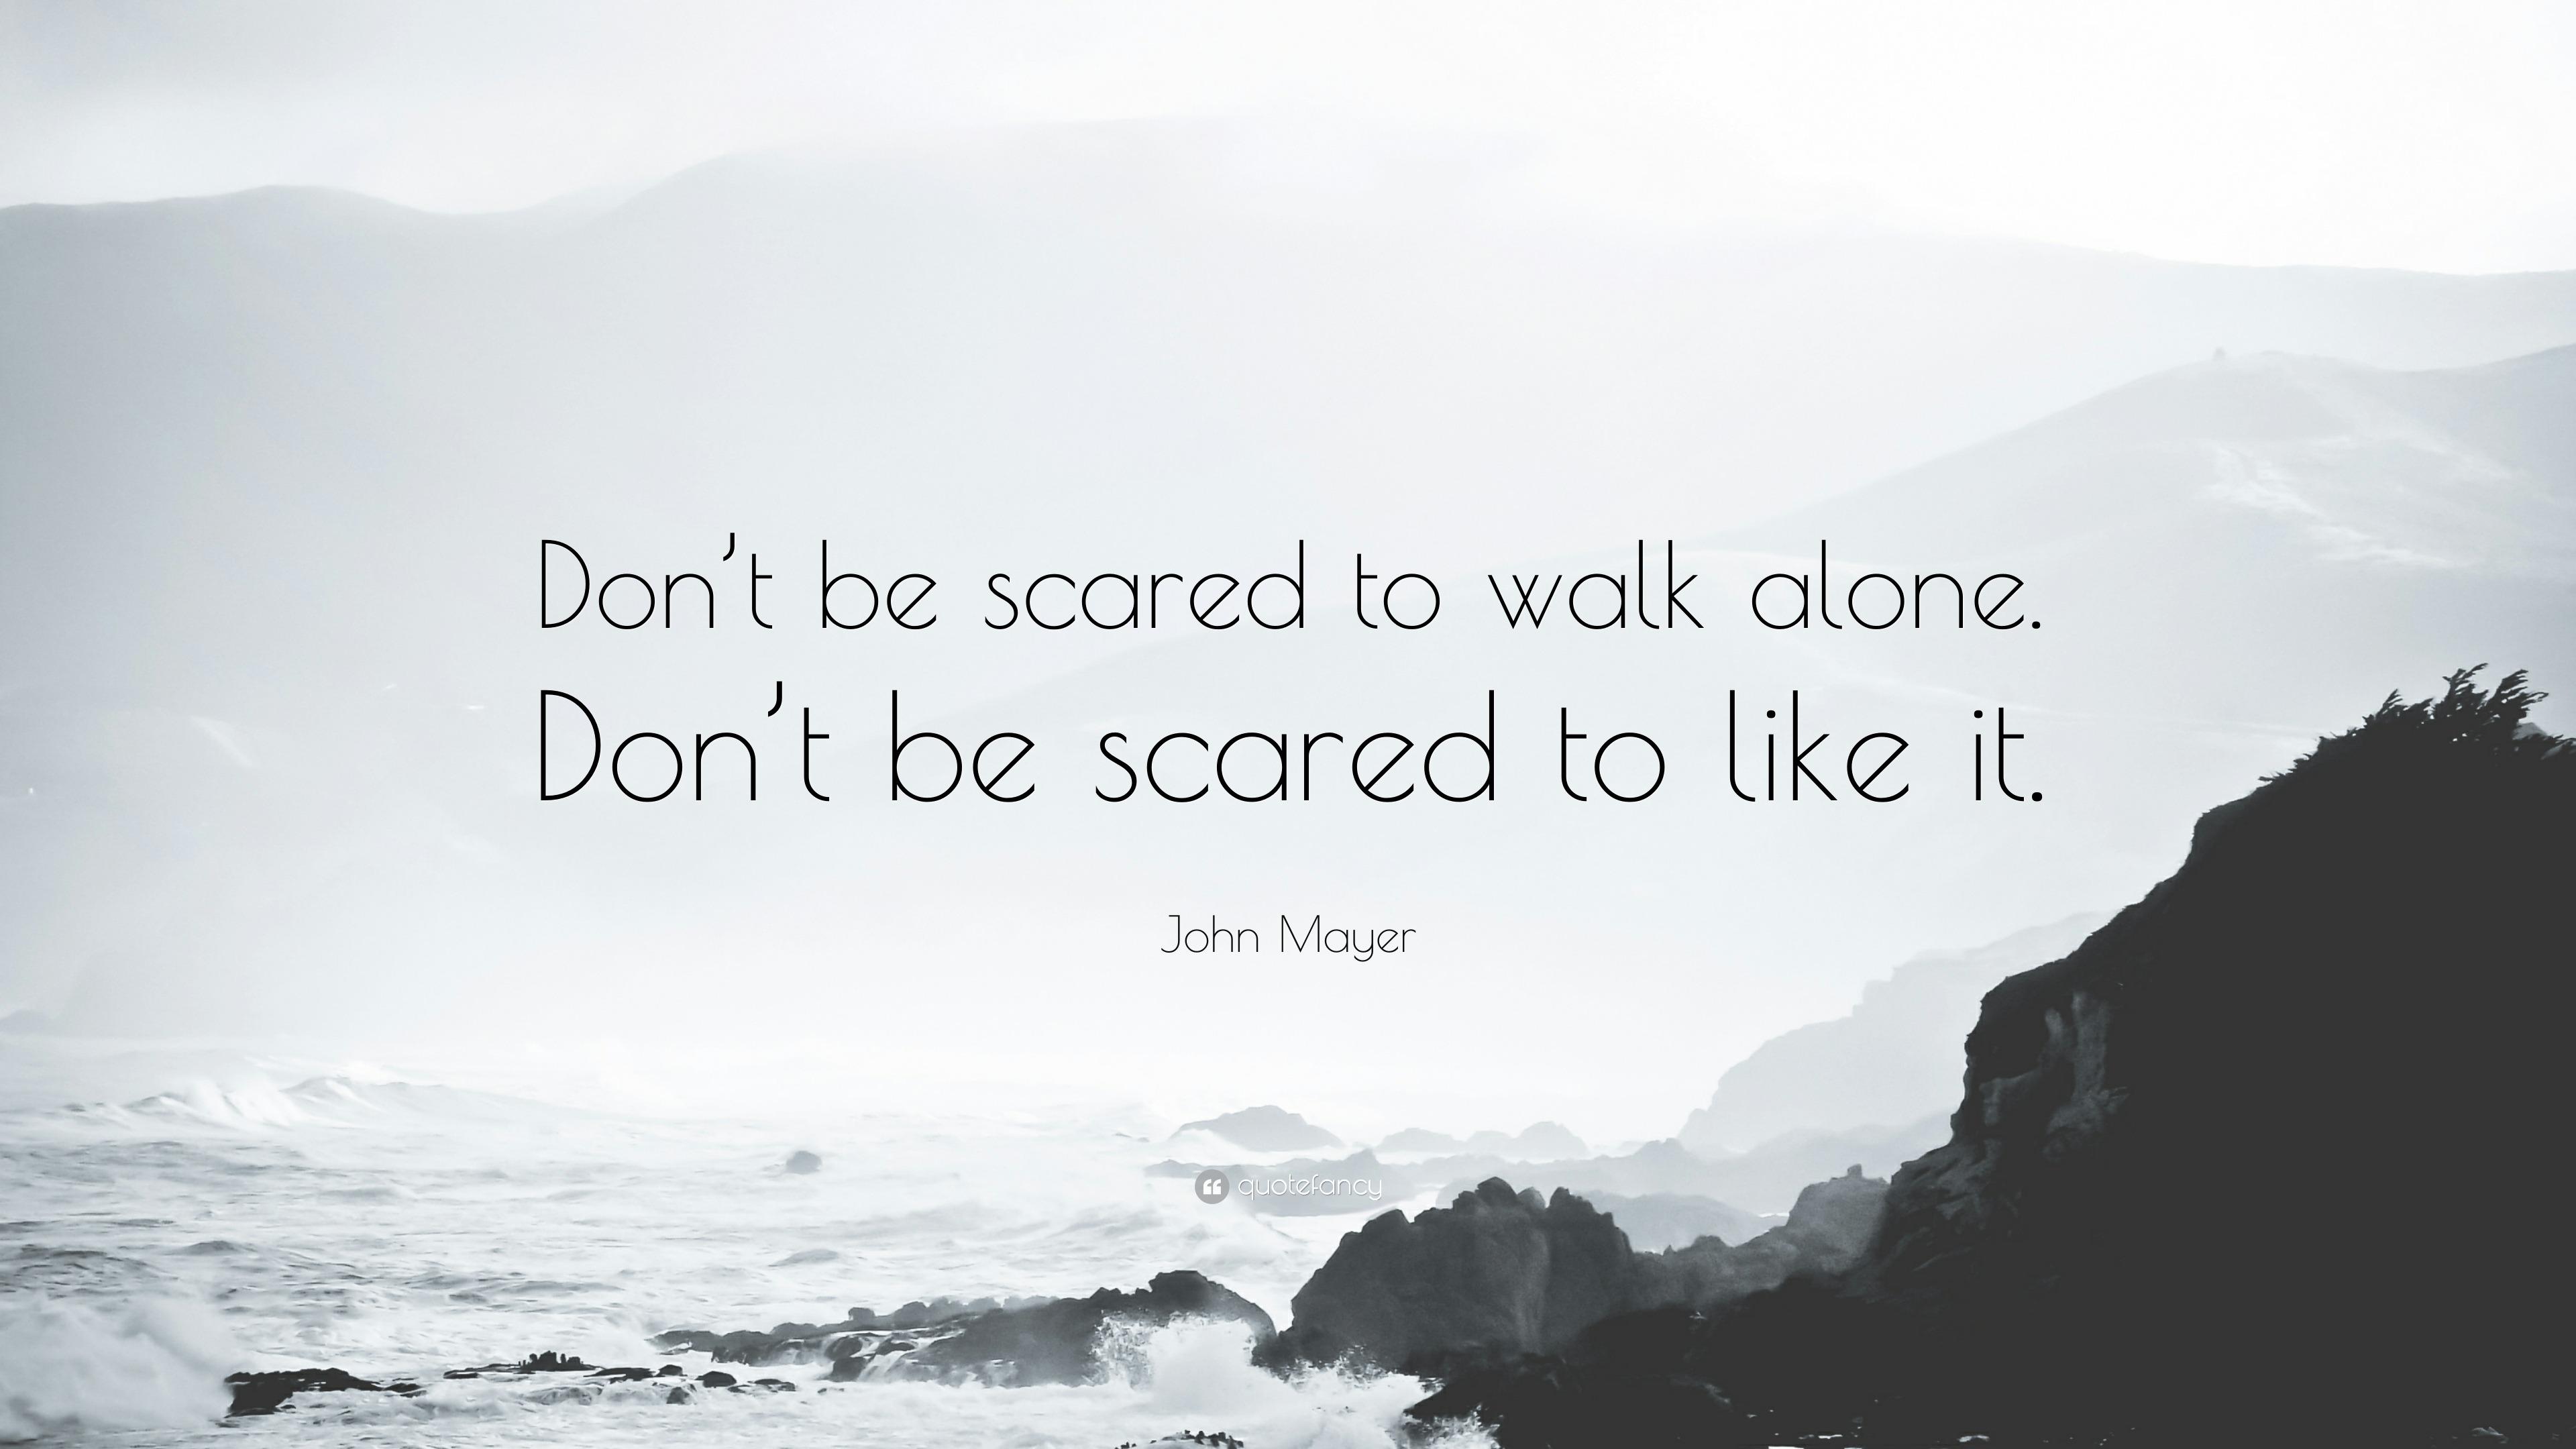 John Mayer Quotes (100 wallpapers) - Quotefancy